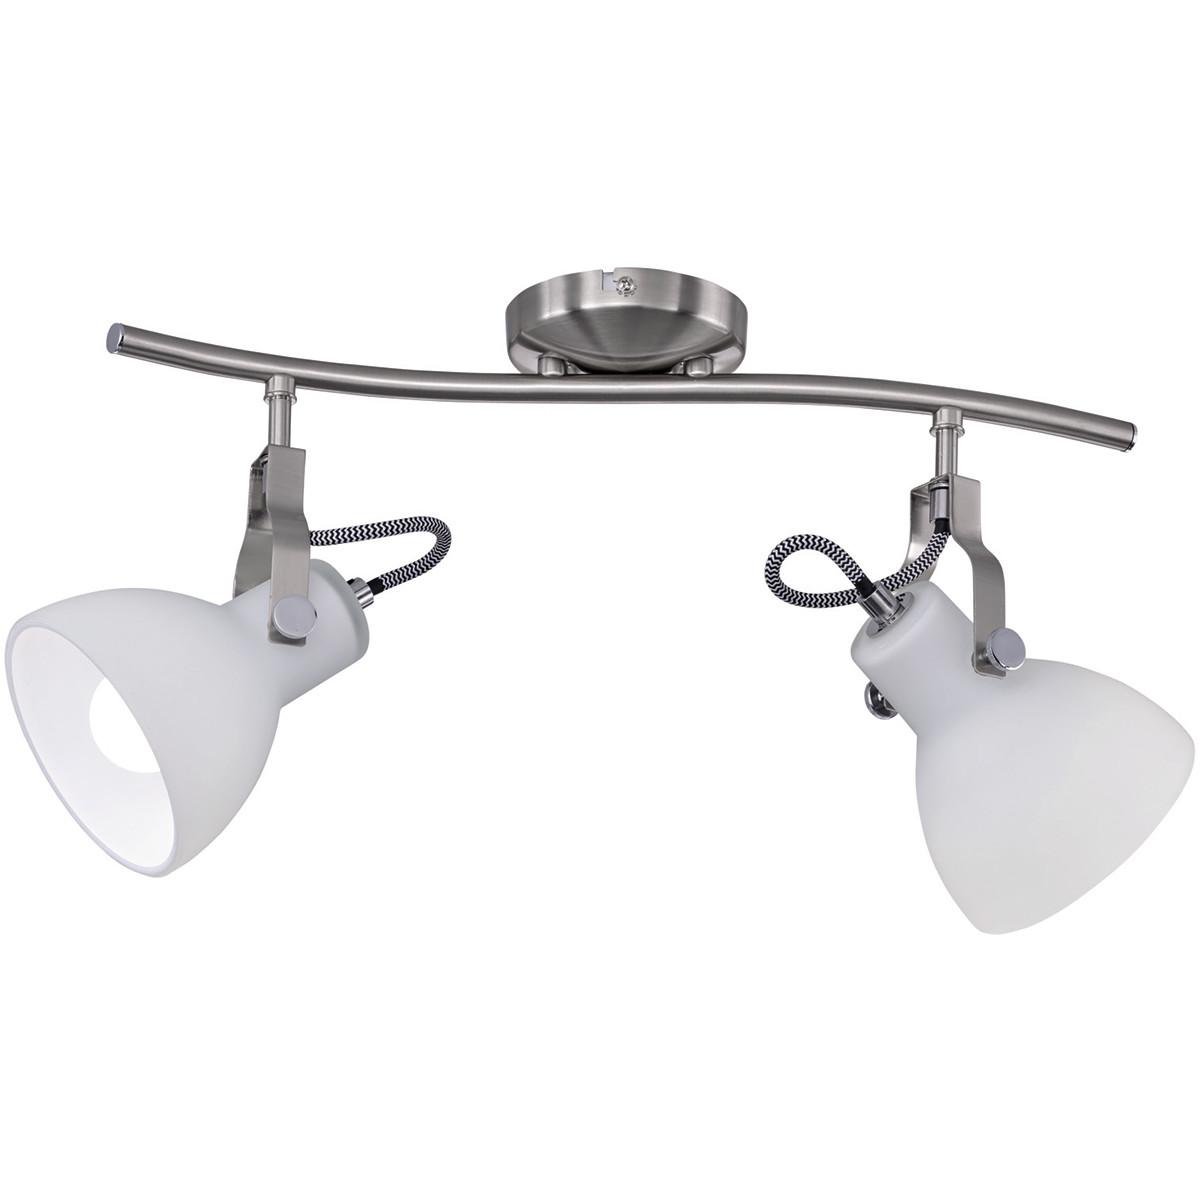 LED Plafondspot - Plafondverlichting - Trion Ginola - E14 Fitting - 2-lichts - Rond - Mat Nikkel - A